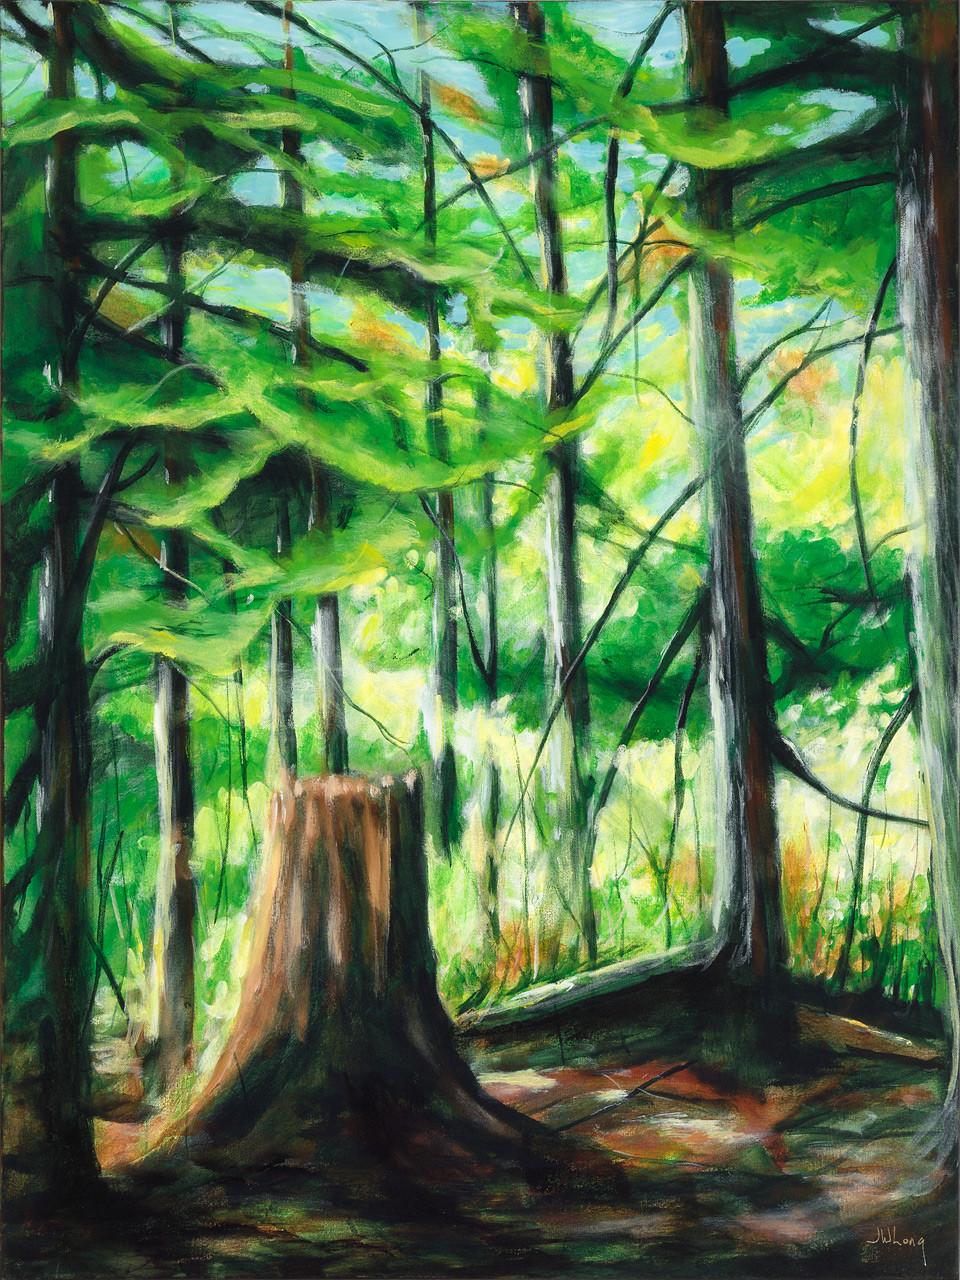 Whispering Trees #1